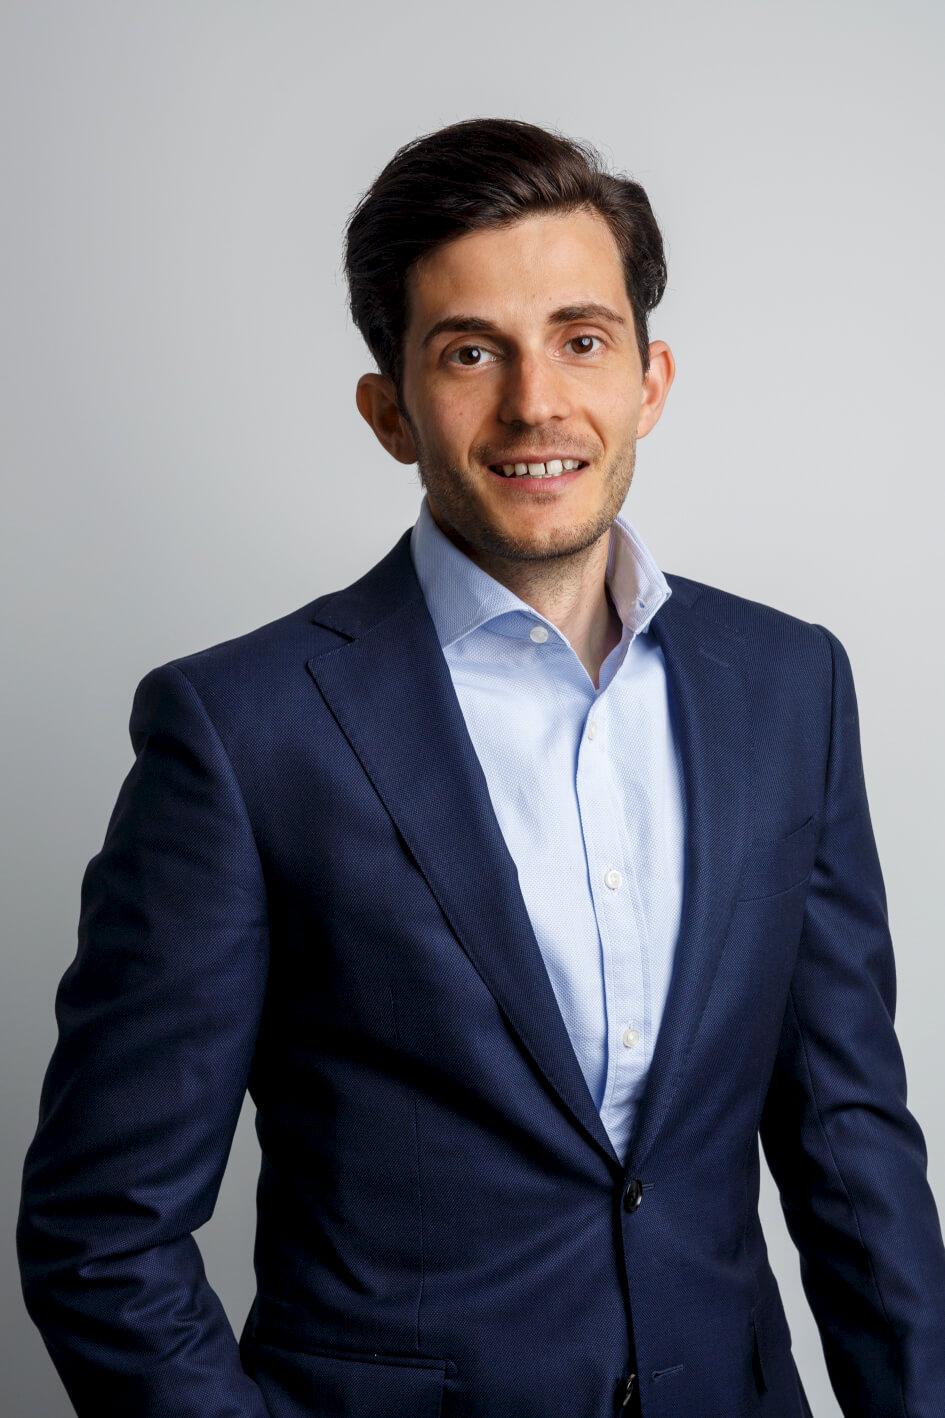 Intermediate Accounting Tax & Advisory Accountant Michael Florio - Here Business & Wealth